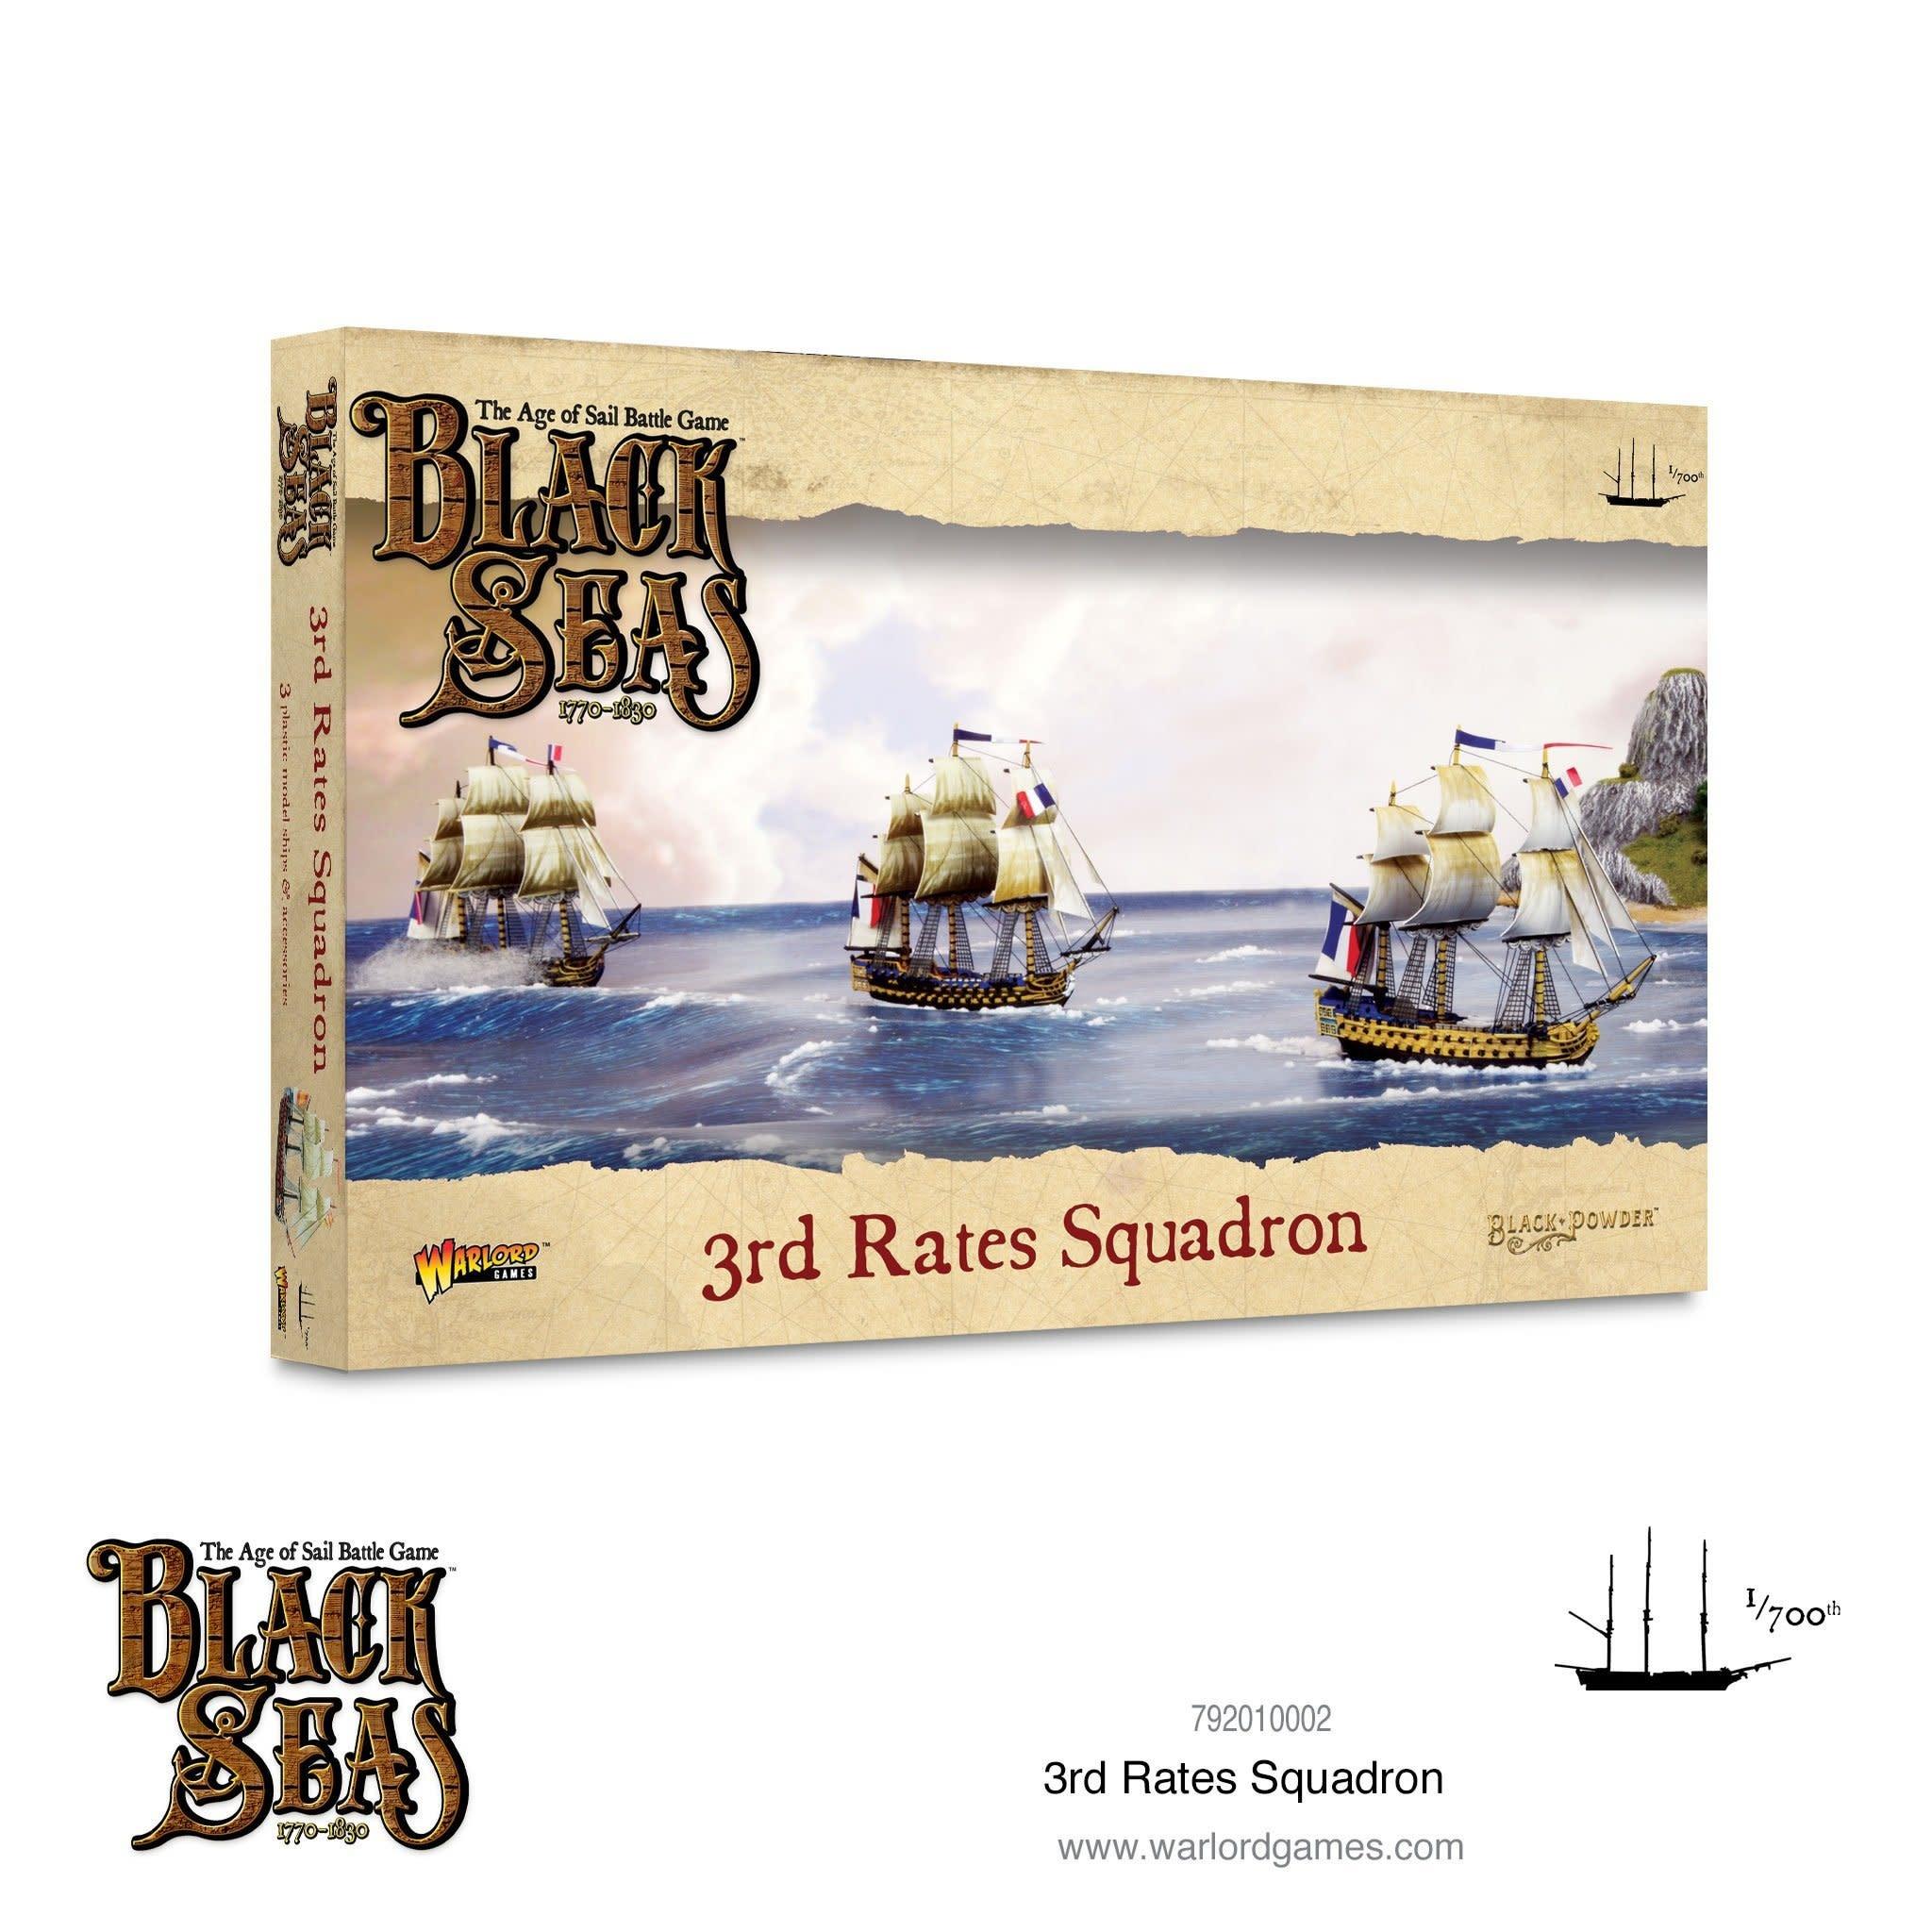 Warlord games Black Seas: 3rd Rates Squadron